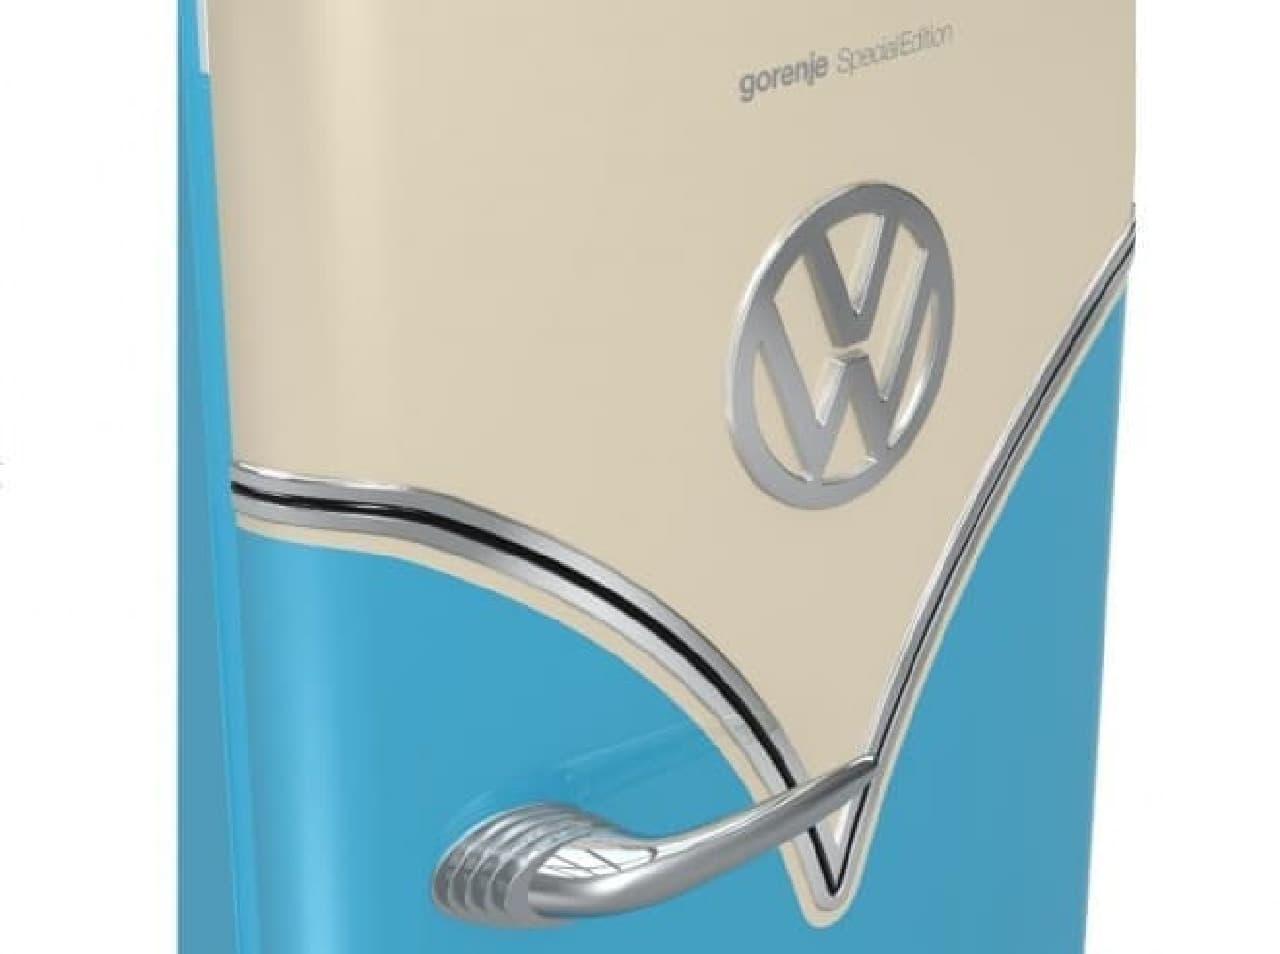 VWバスにインスパイヤされた冷蔵庫「Retro VW Bulli」